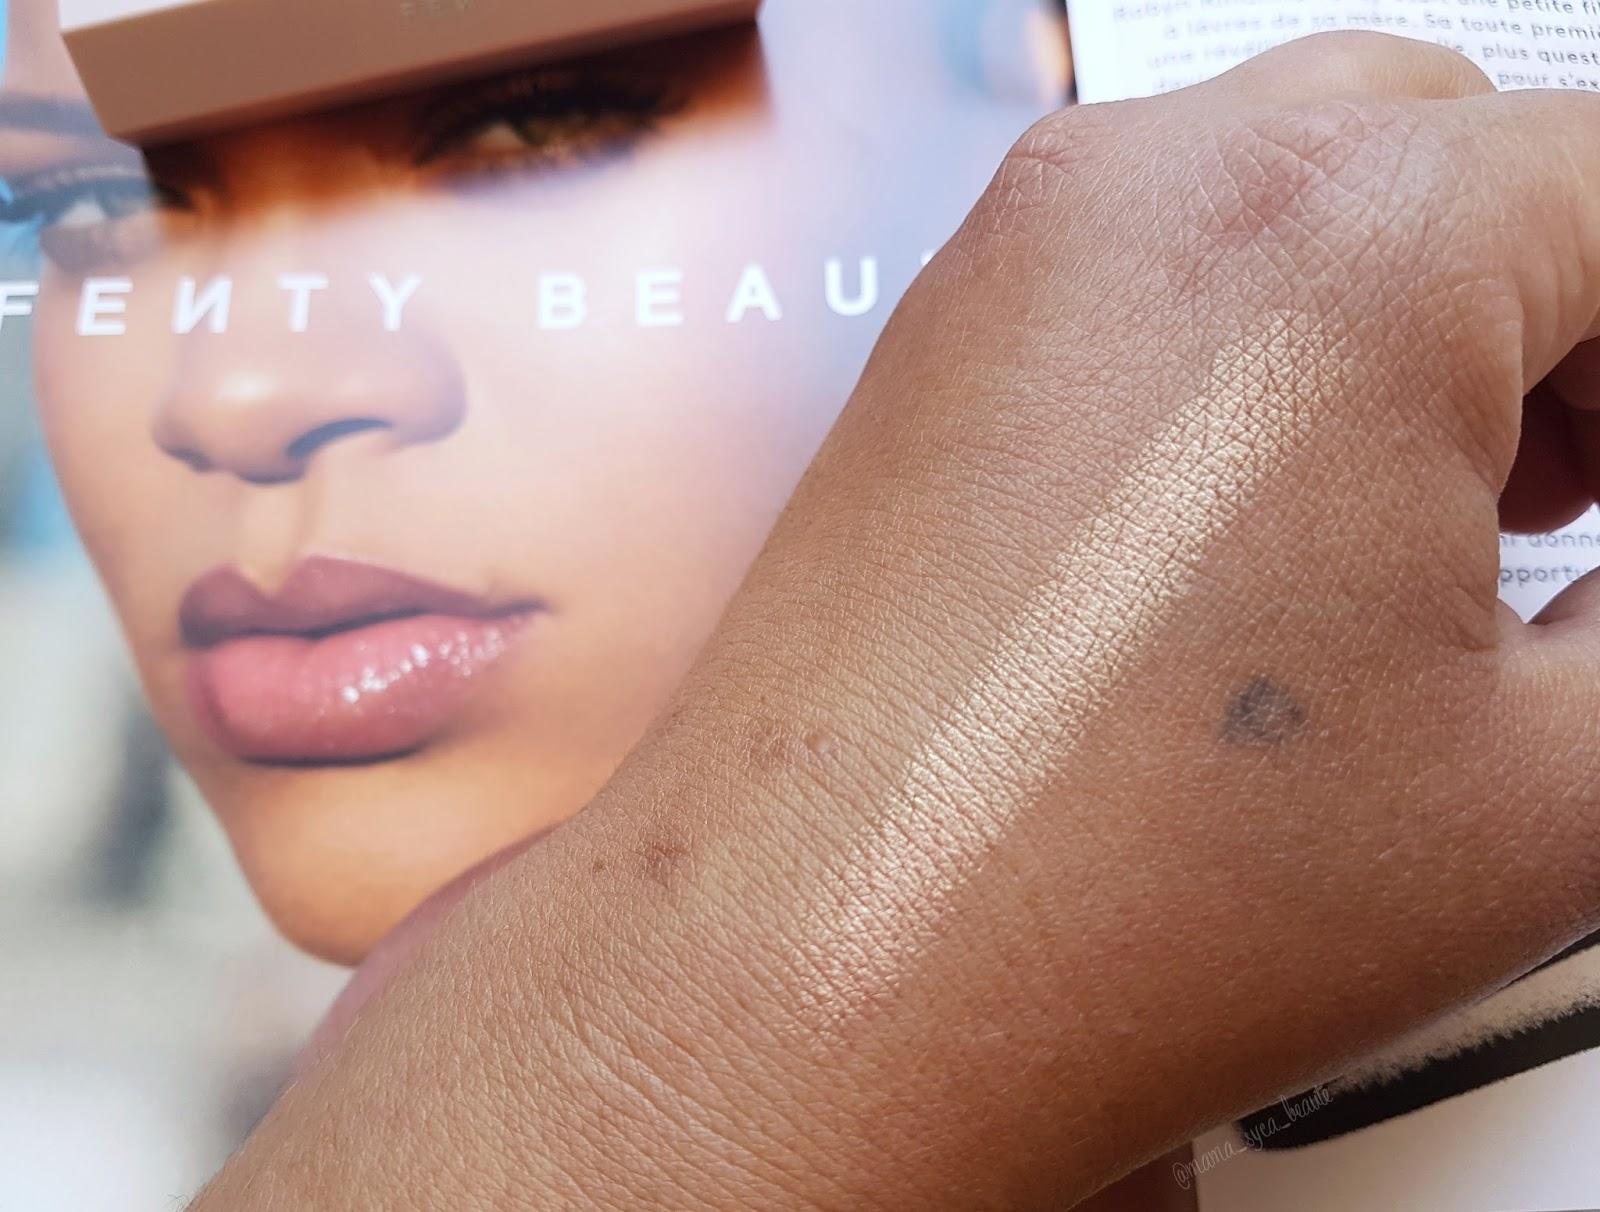 avis_match_stix_shimmer_skintick_fenty_beauty_by_rihanna_sephora_swatch_mama_syca_beaute